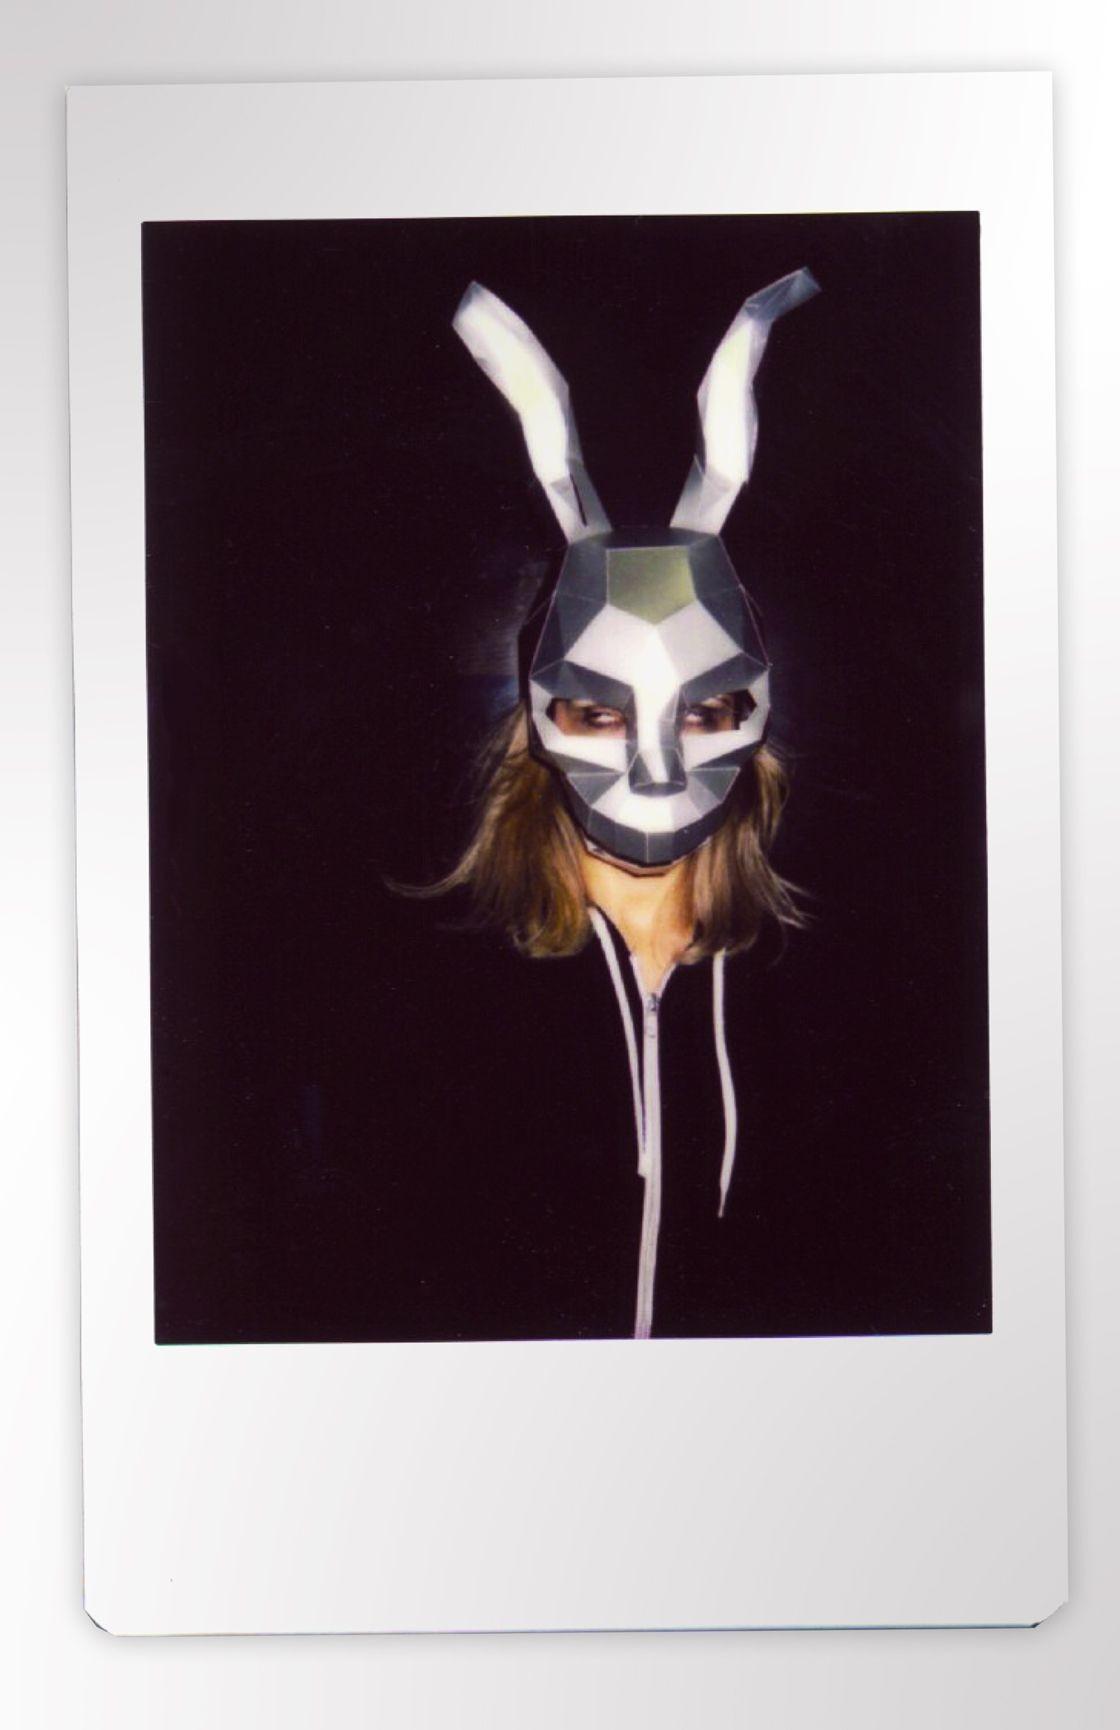 Papercraft Rabbit Frank Rabbit Mask Donnie Darko Mask Hare Mask Diy 3dmask Pdf Paper